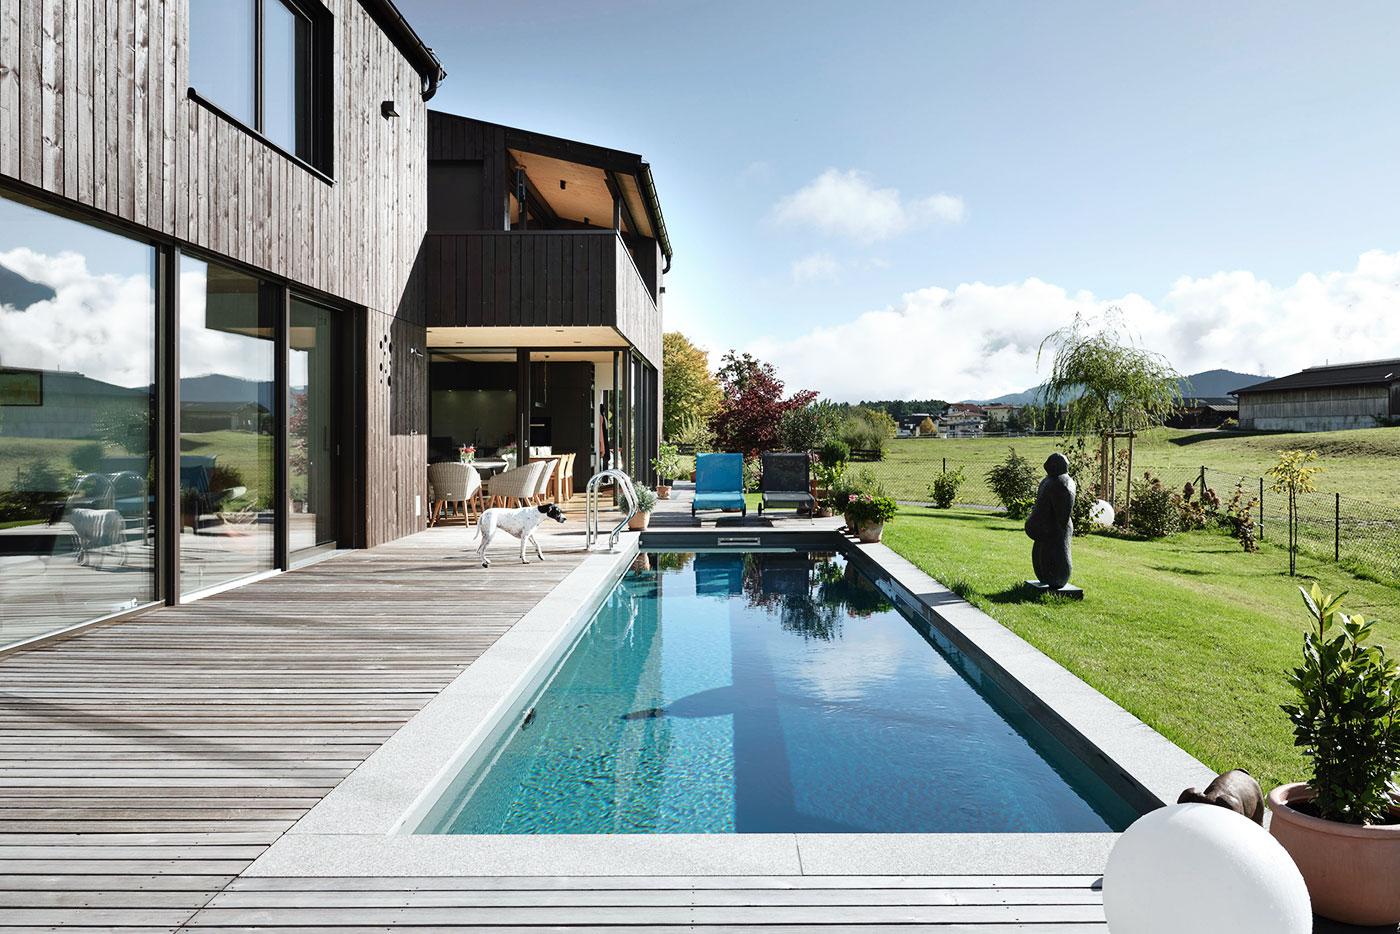 privat-k-niveko-sst-pool-referenz-01-SST-Saurwein-Schwimmbad-Technik